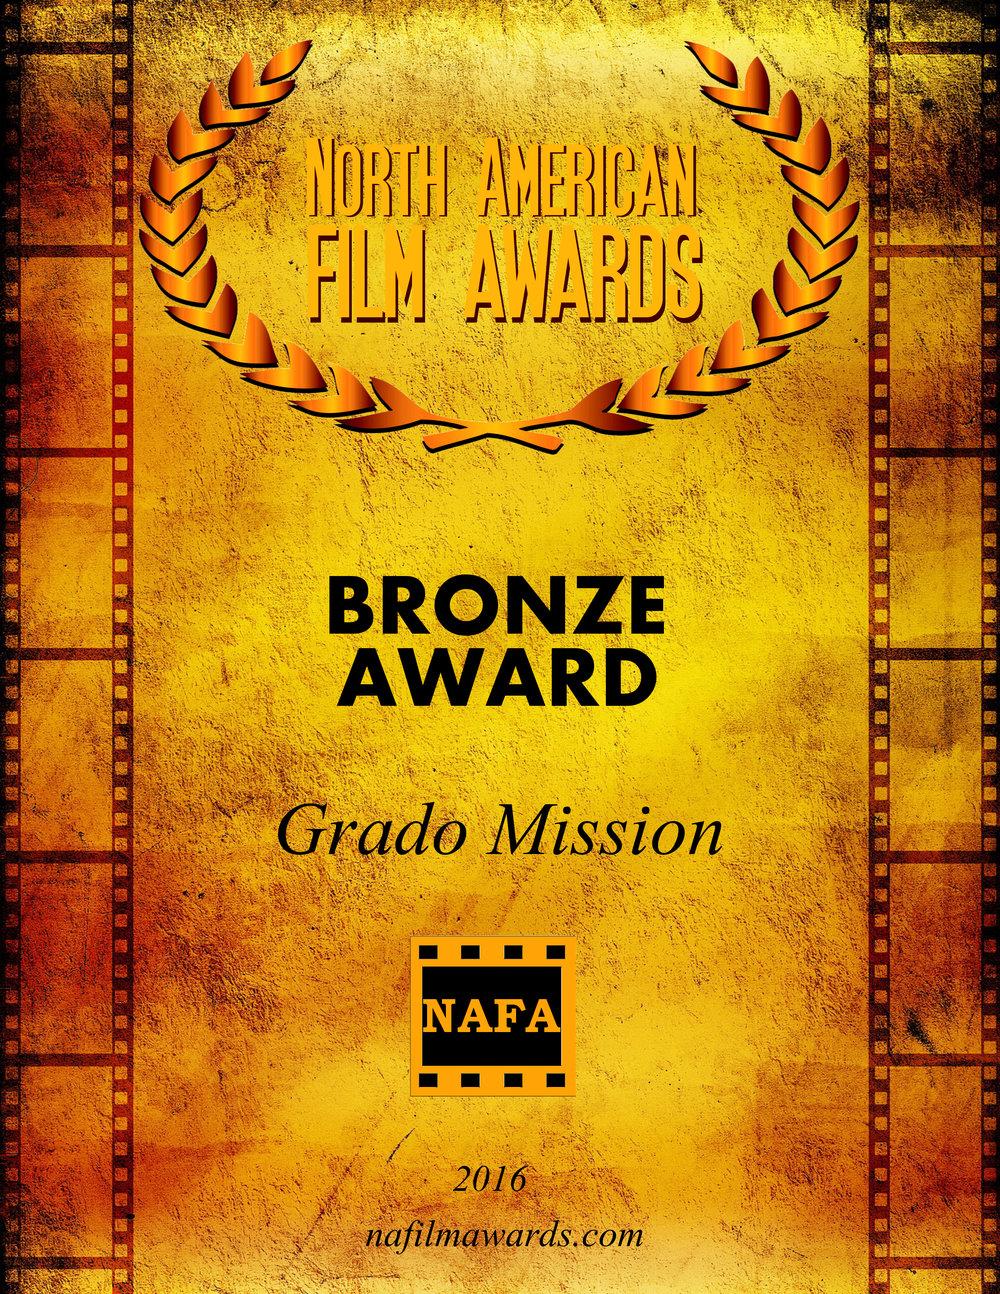 Grado Mission- Bronze Award Certificate.jpg